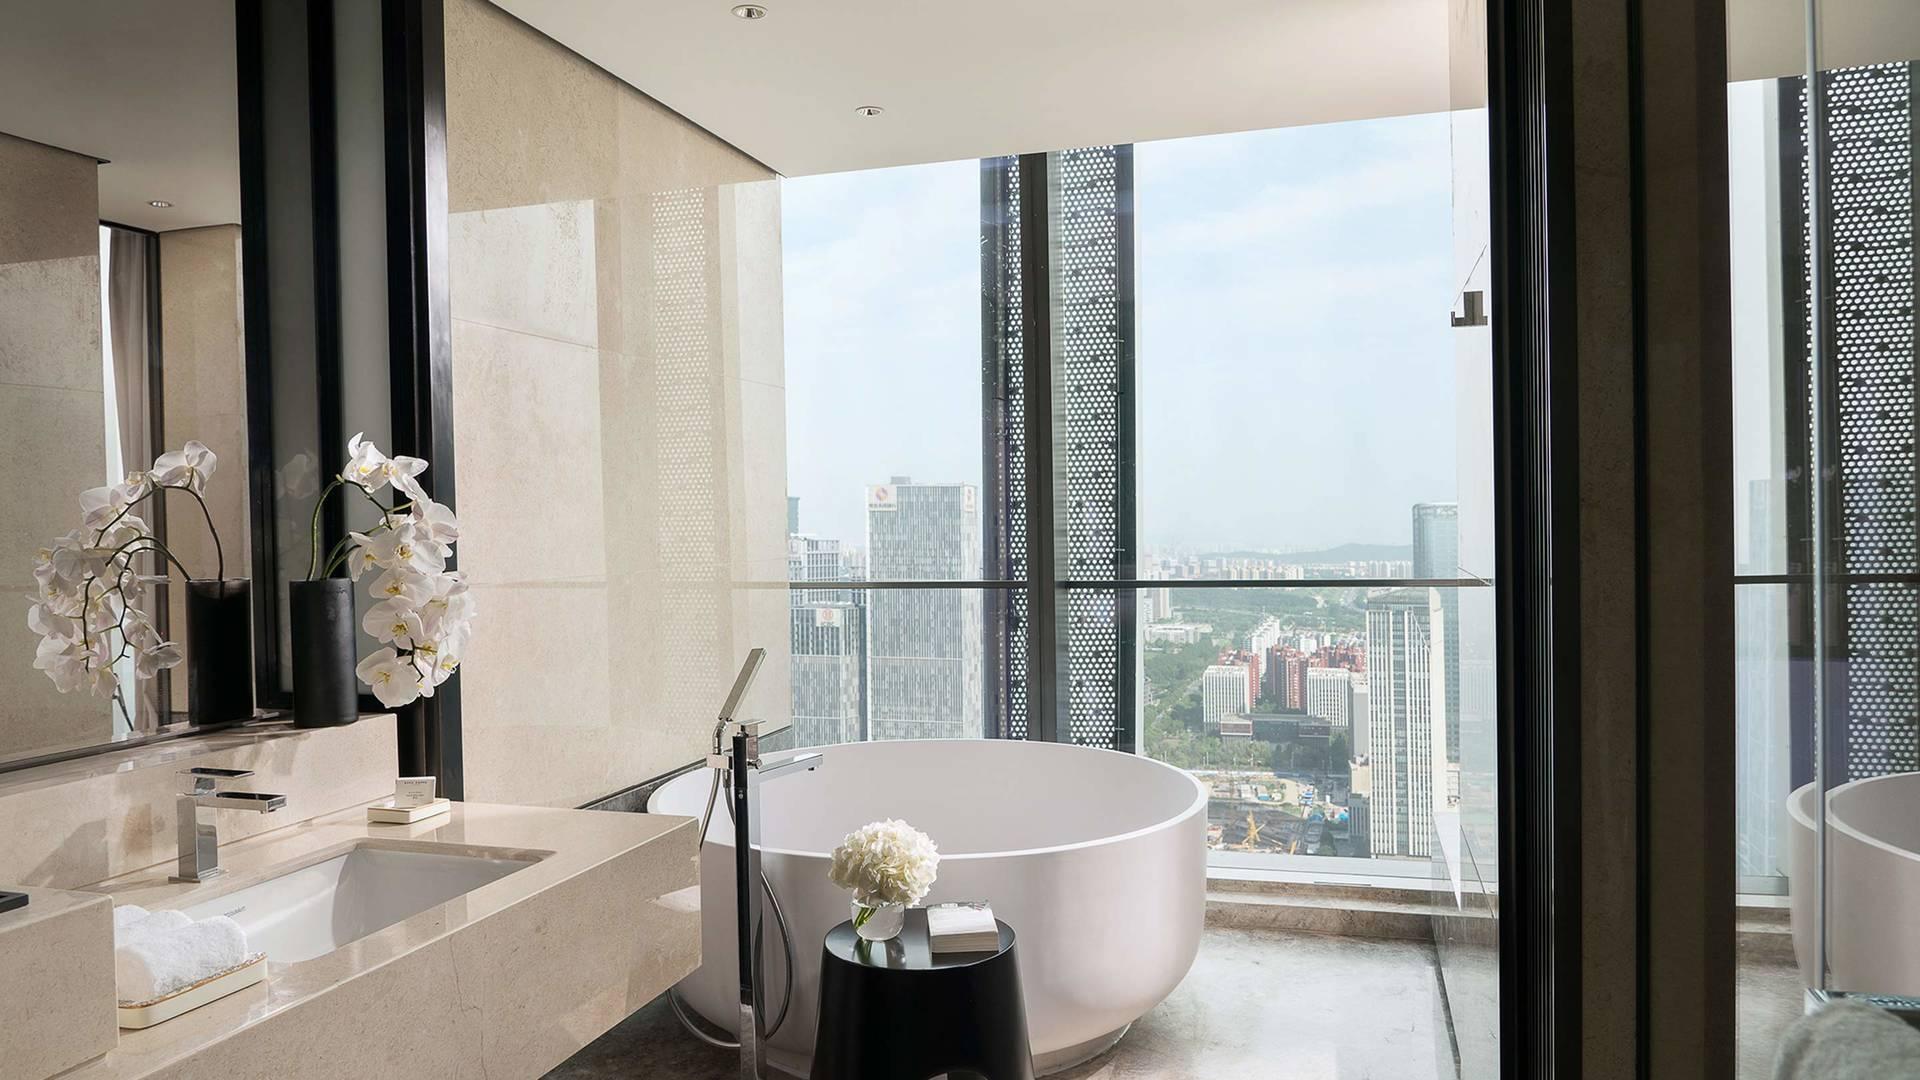 Jumeirah bathroom views Nanjing_6-9